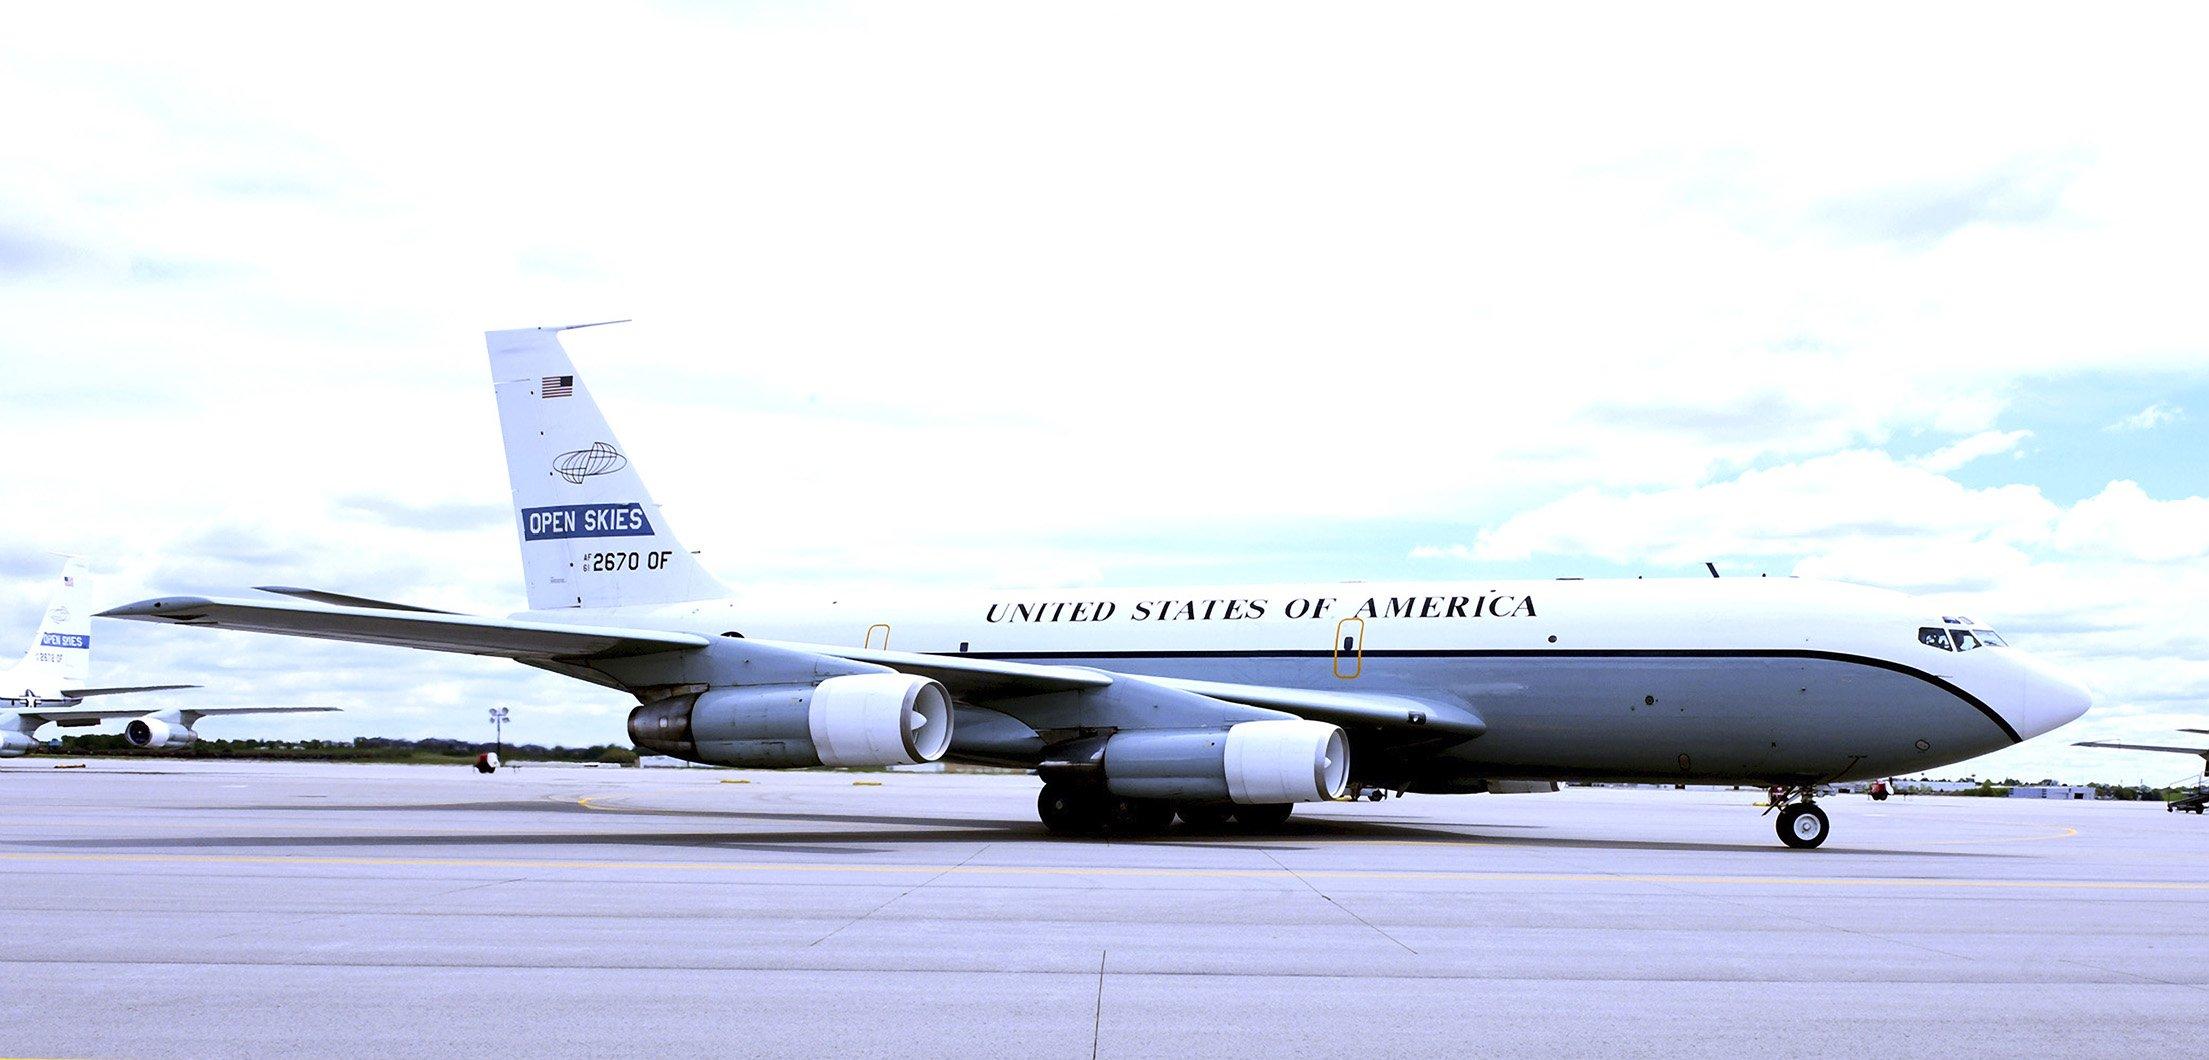 Final OC-135B retirement [USAF/Offutt AFB]